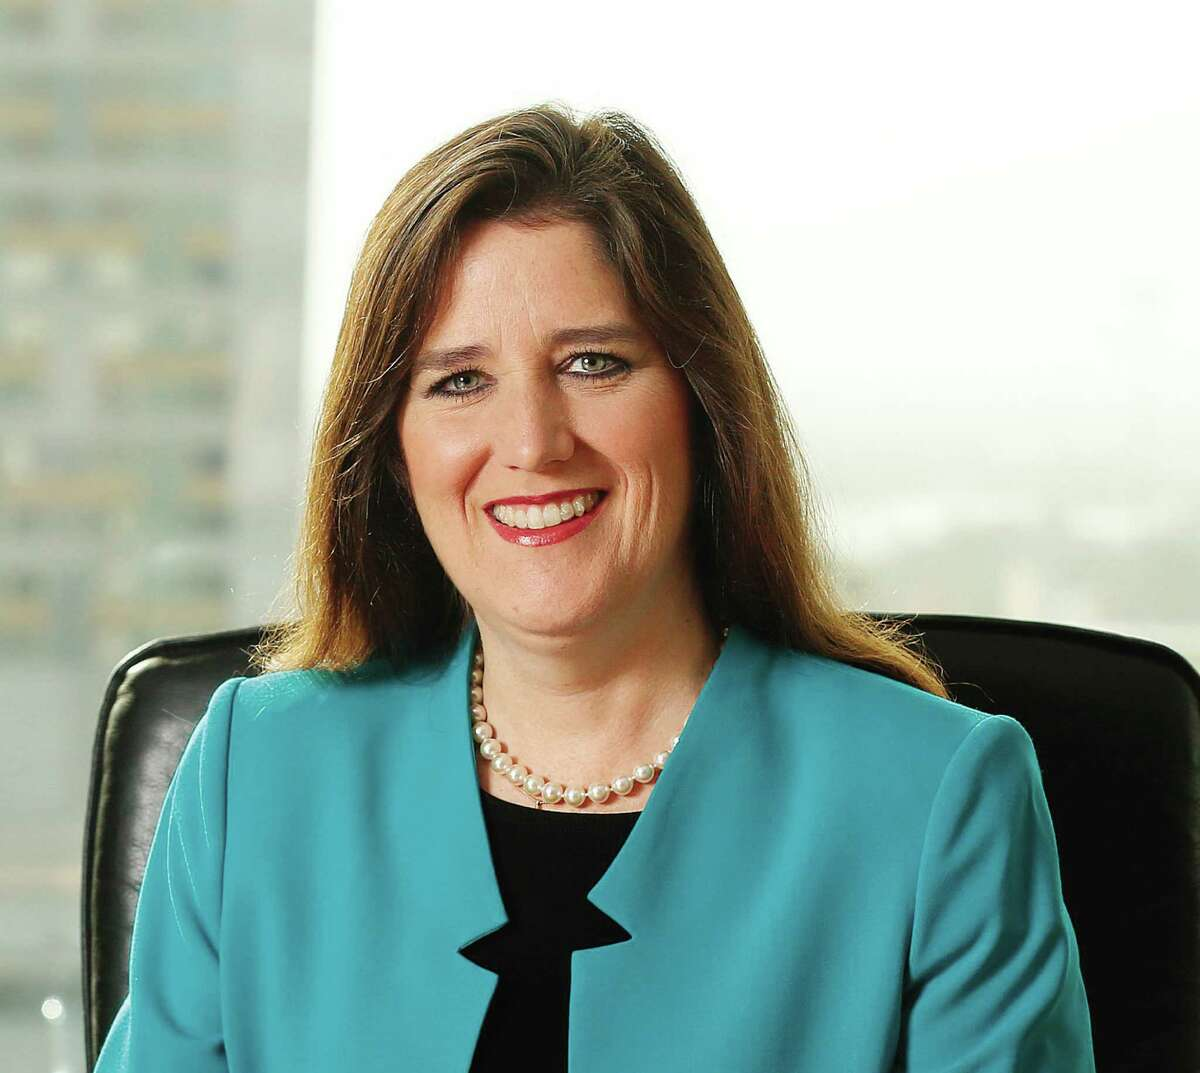 23. Elizabeth Killinger Company/Position: NRG Energy Inc., Senior Vice President and President NRG Retail Base Salary:$460,904 Total compensation:$1,789,594